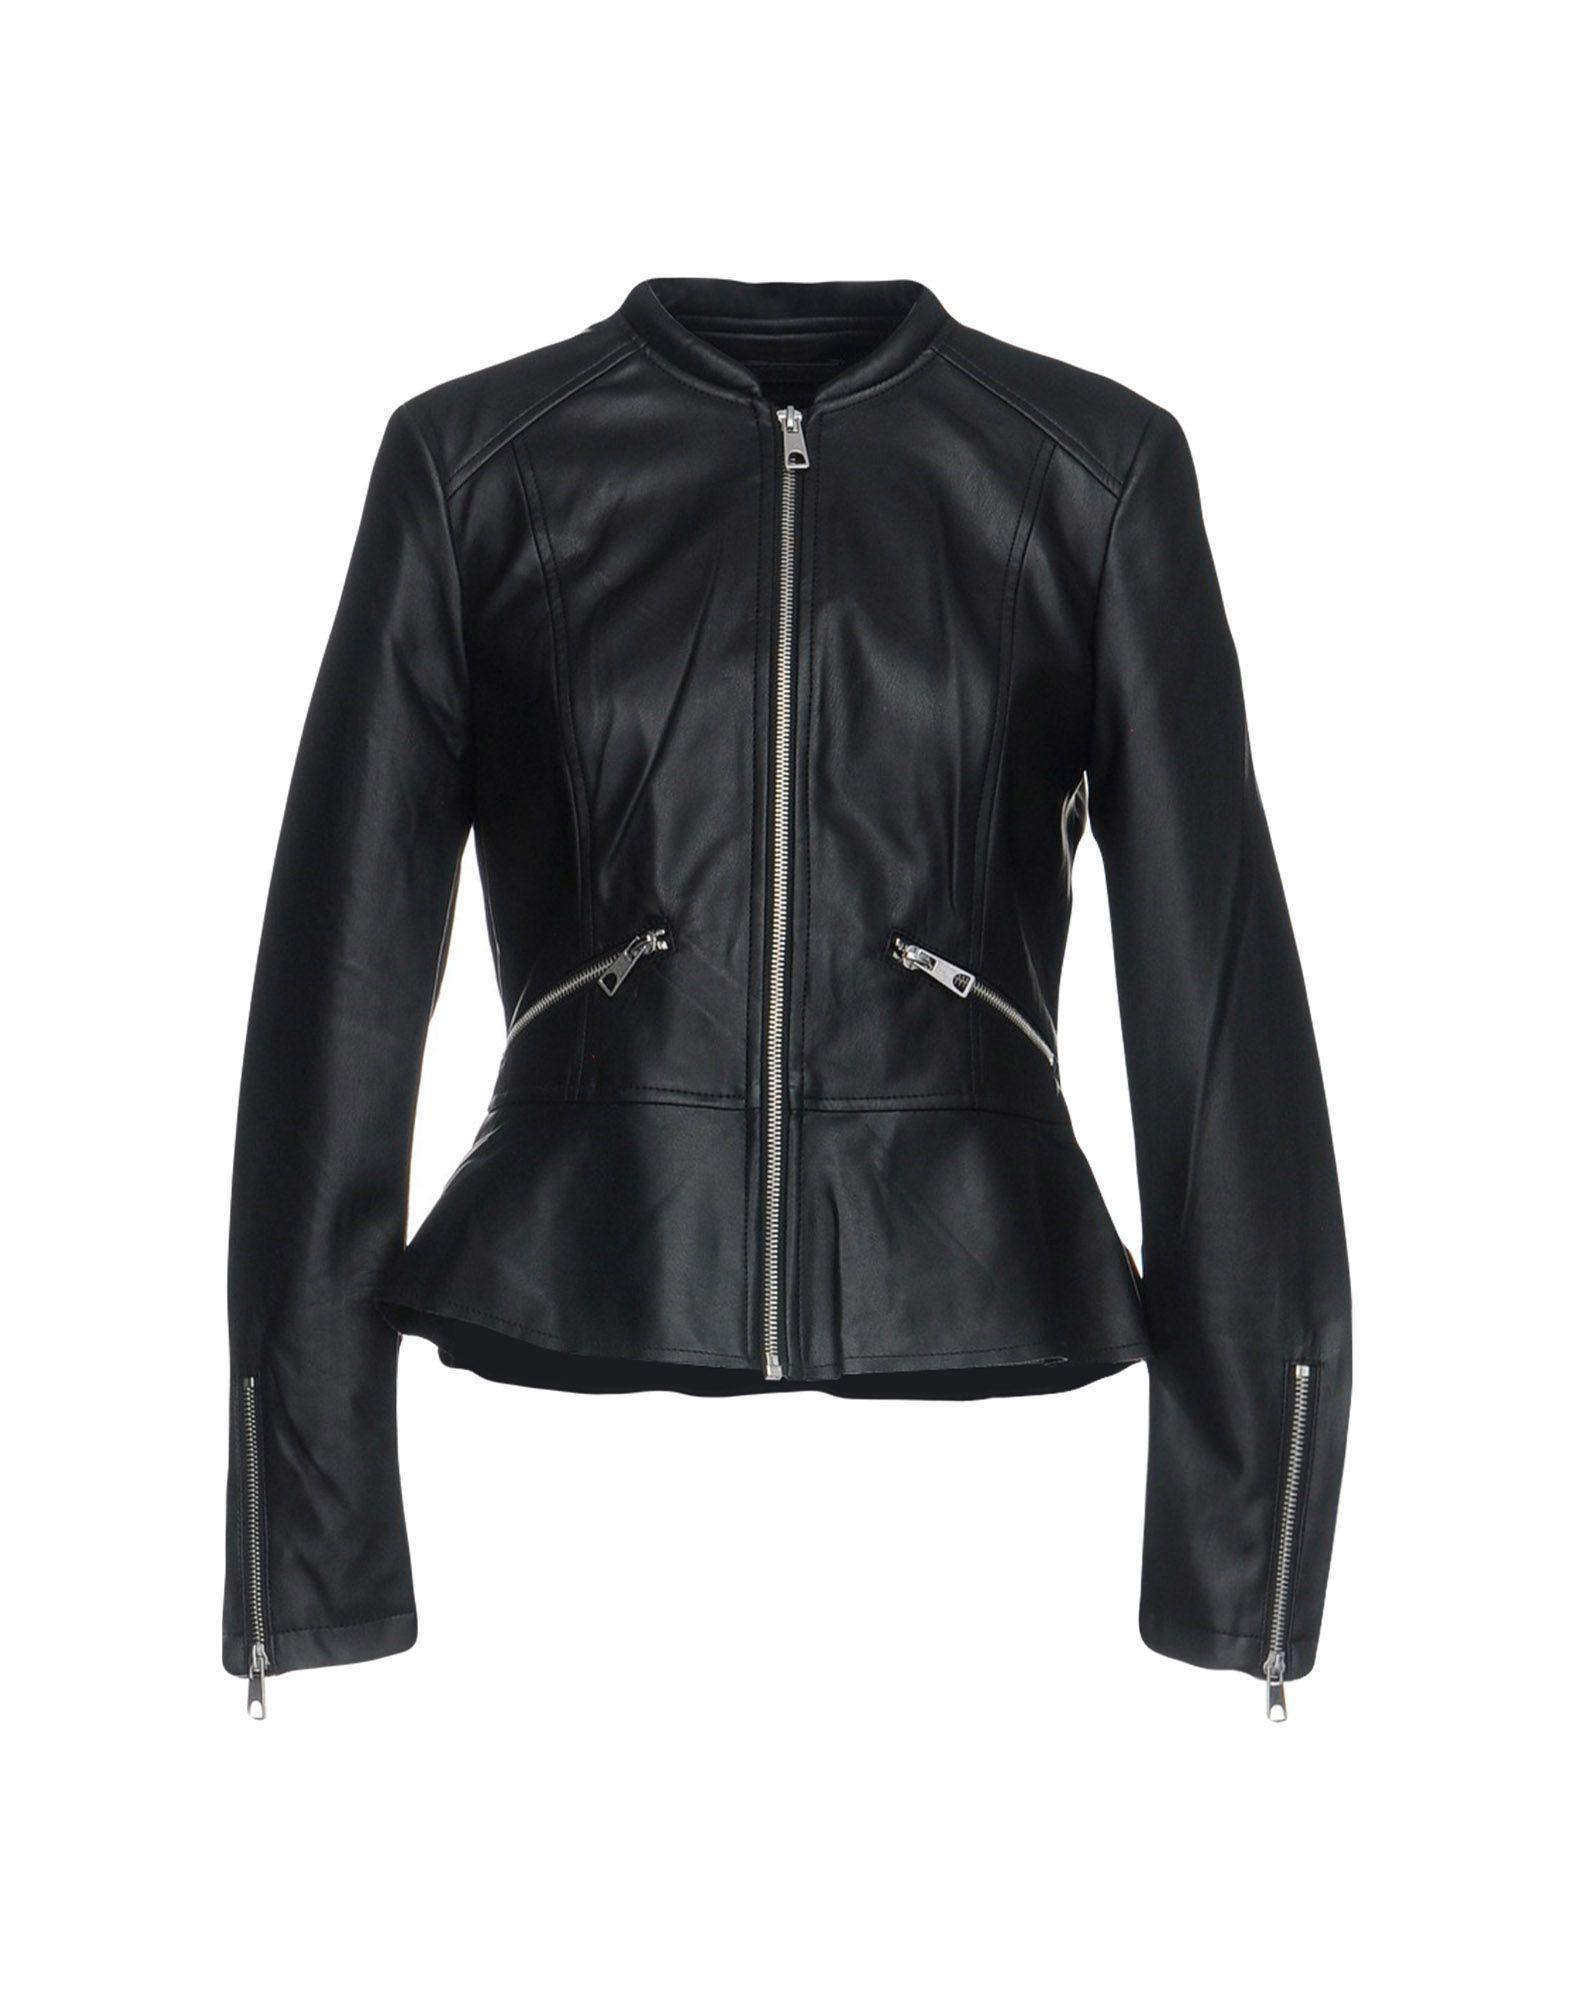 Vero Moda Biker Jacket In Black